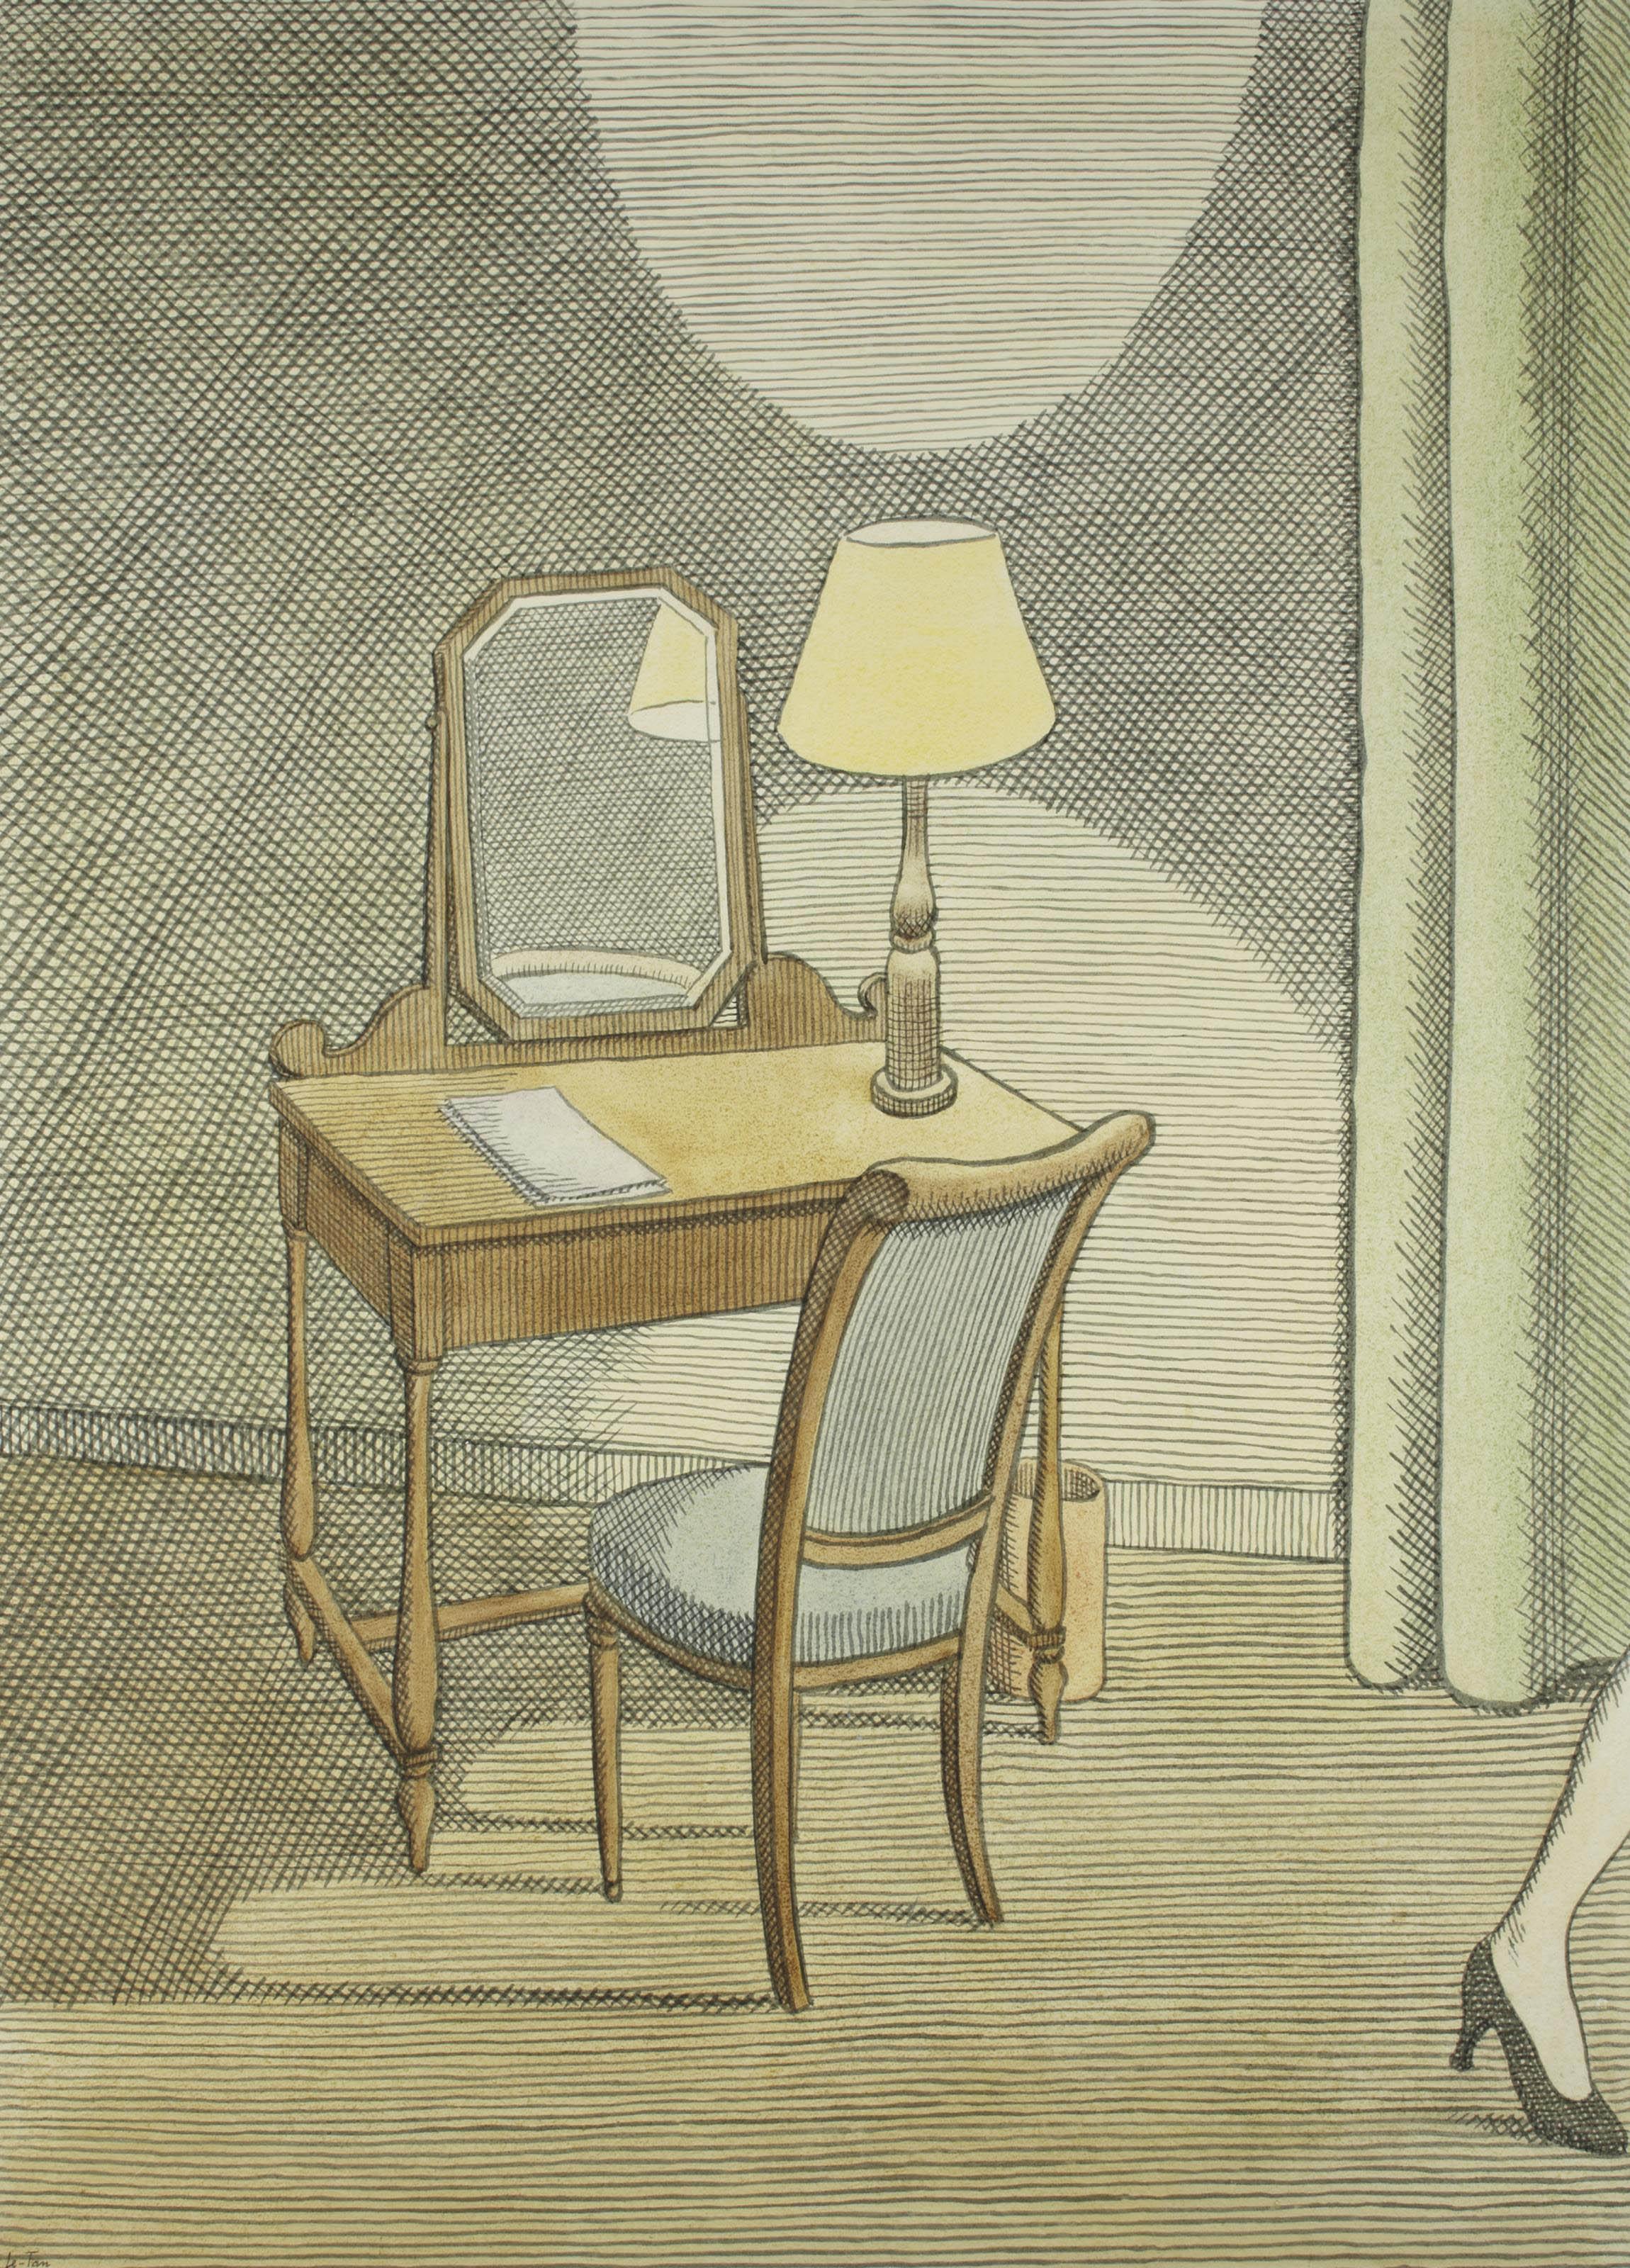 PIERRE LE-TAN (NÉ EN 1950)